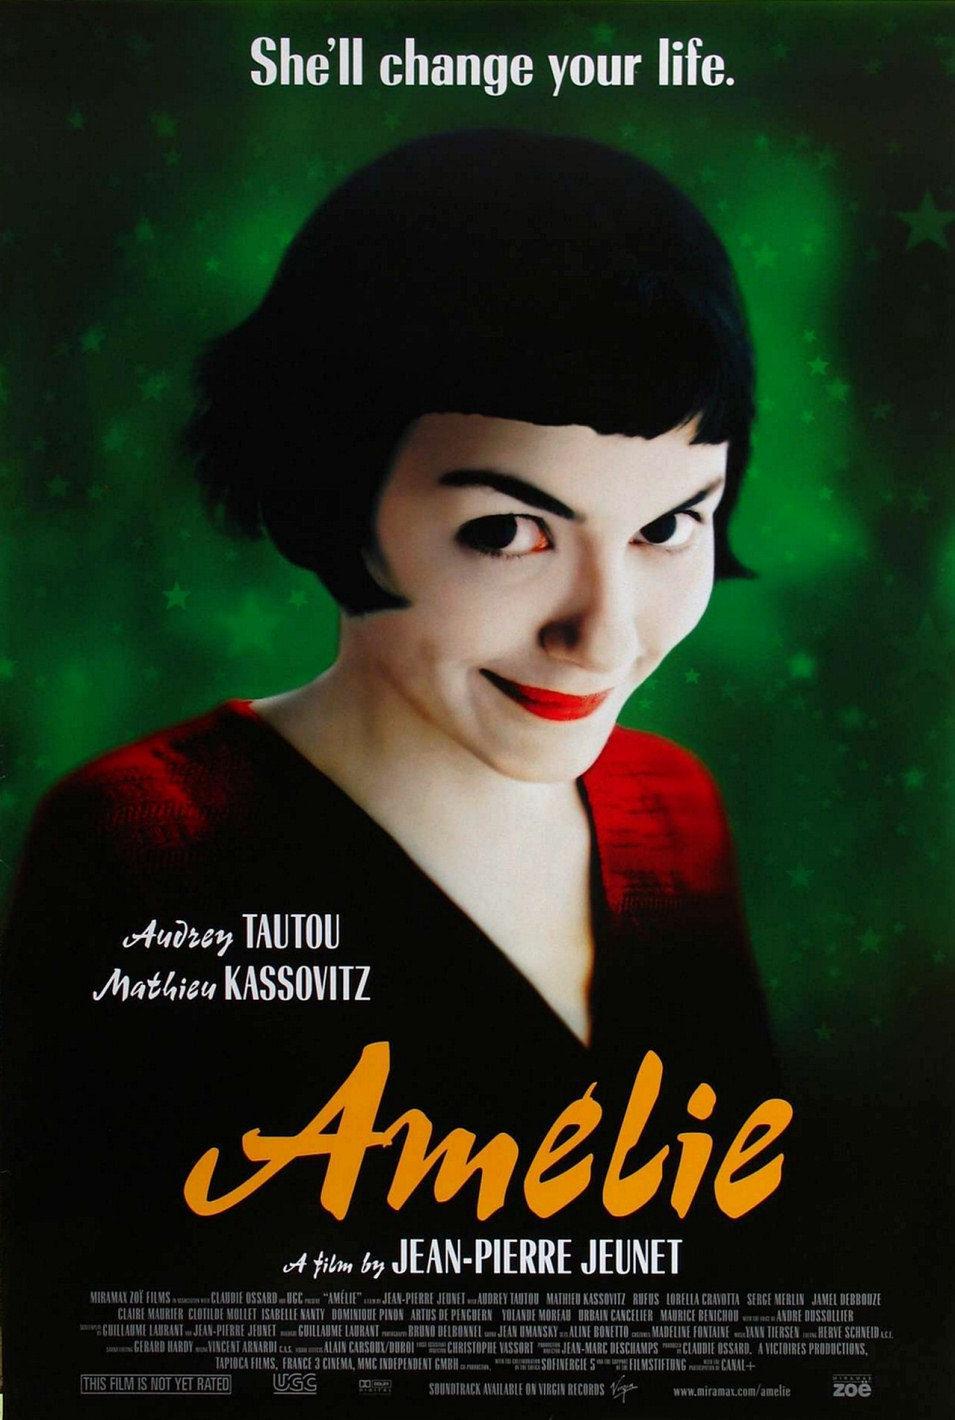 Estados Unidos poster for Amélie